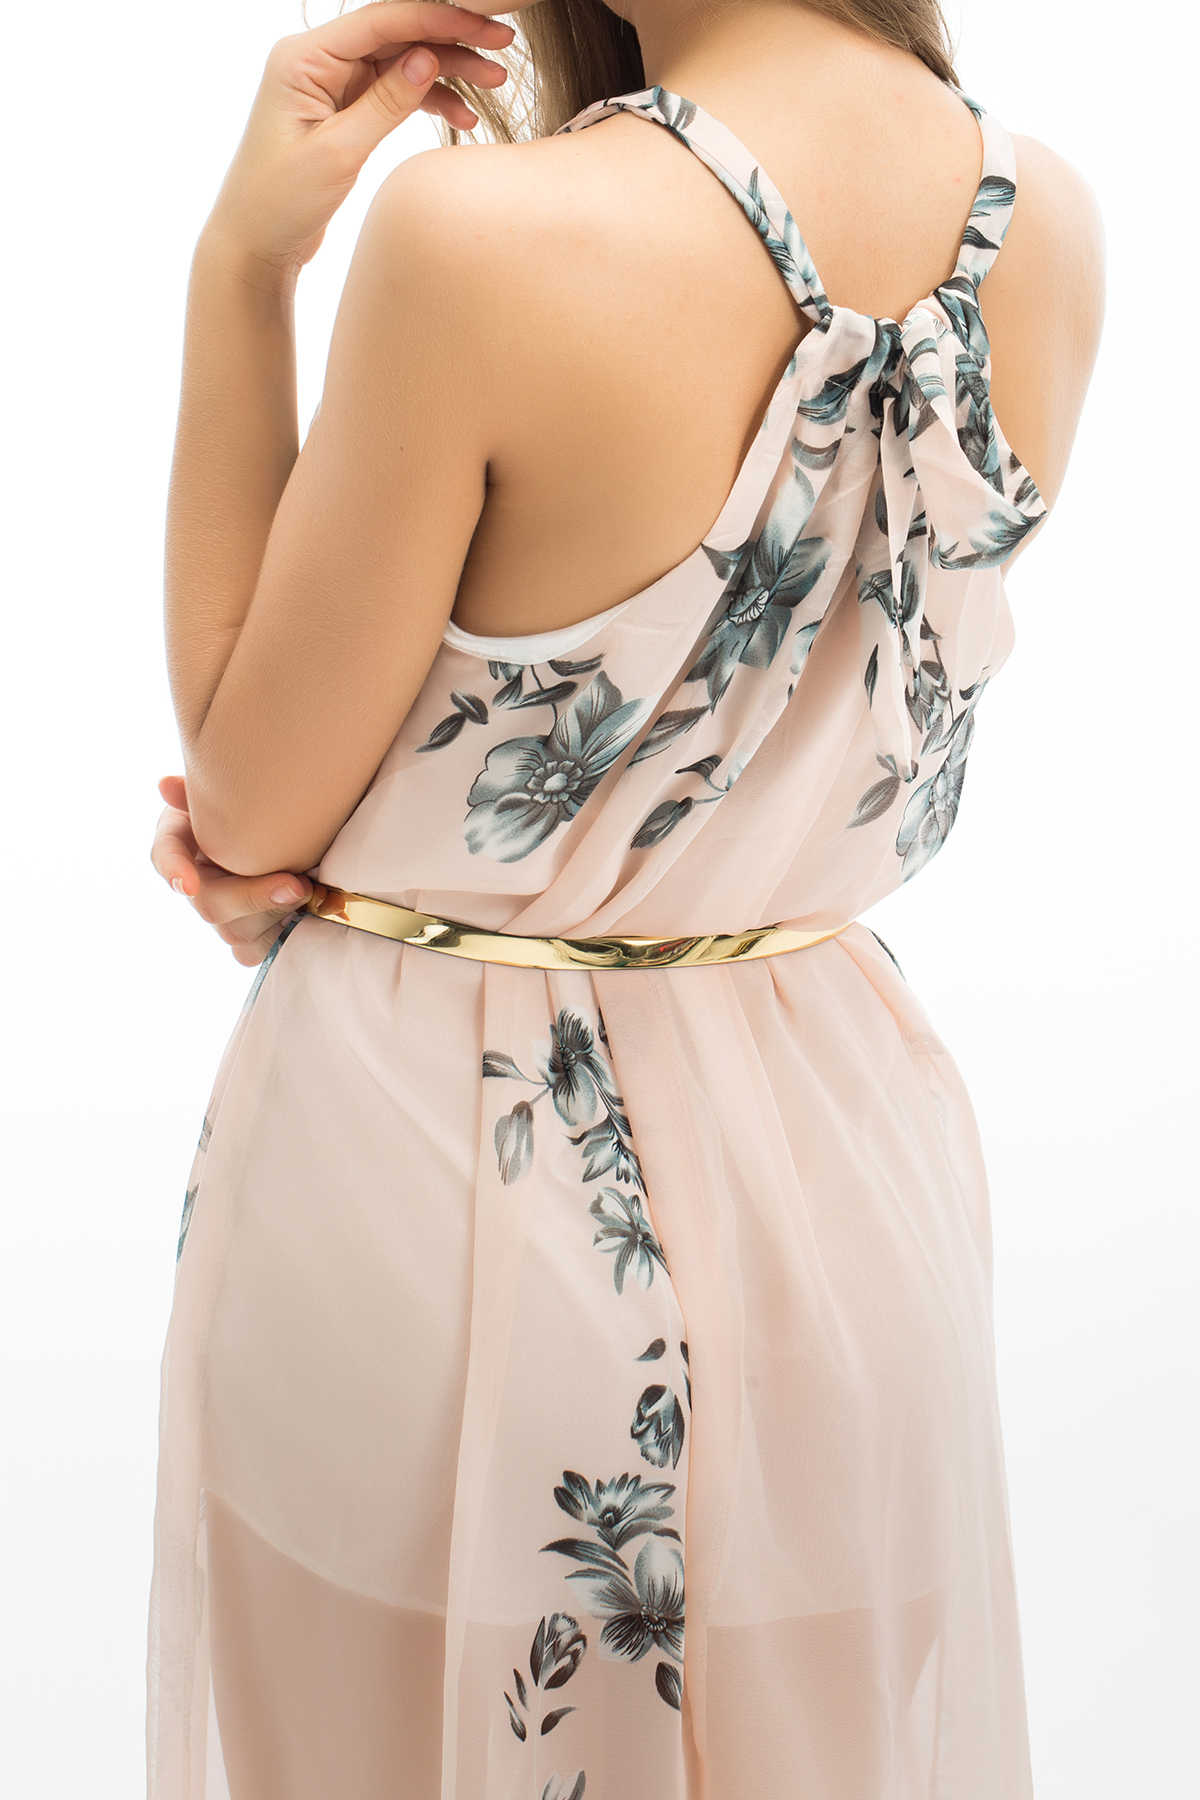 8312115d96343 ... 2018 Brand New Women Long Formal Prom Floral Boho Chiffon Dress Beach  Party Chiffon Summer Sleeveless